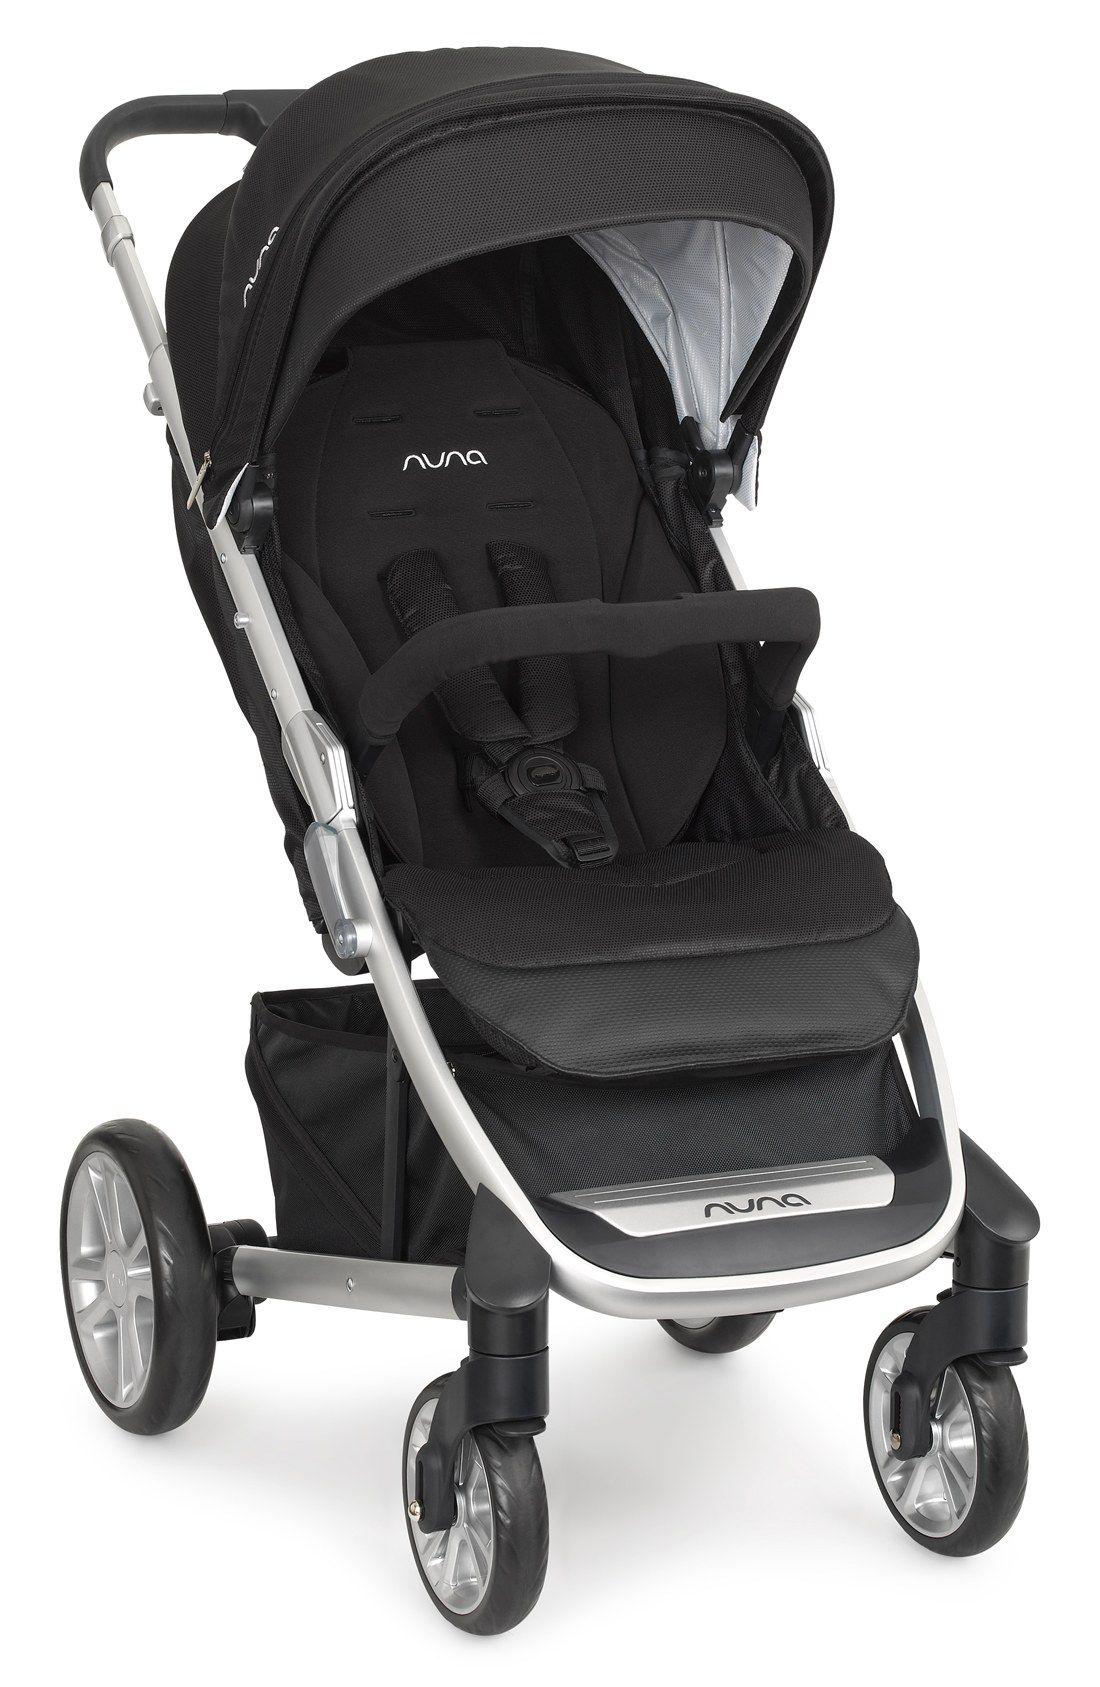 nuna 'TAVO™' Travel System (Stroller, Car Seat & Base